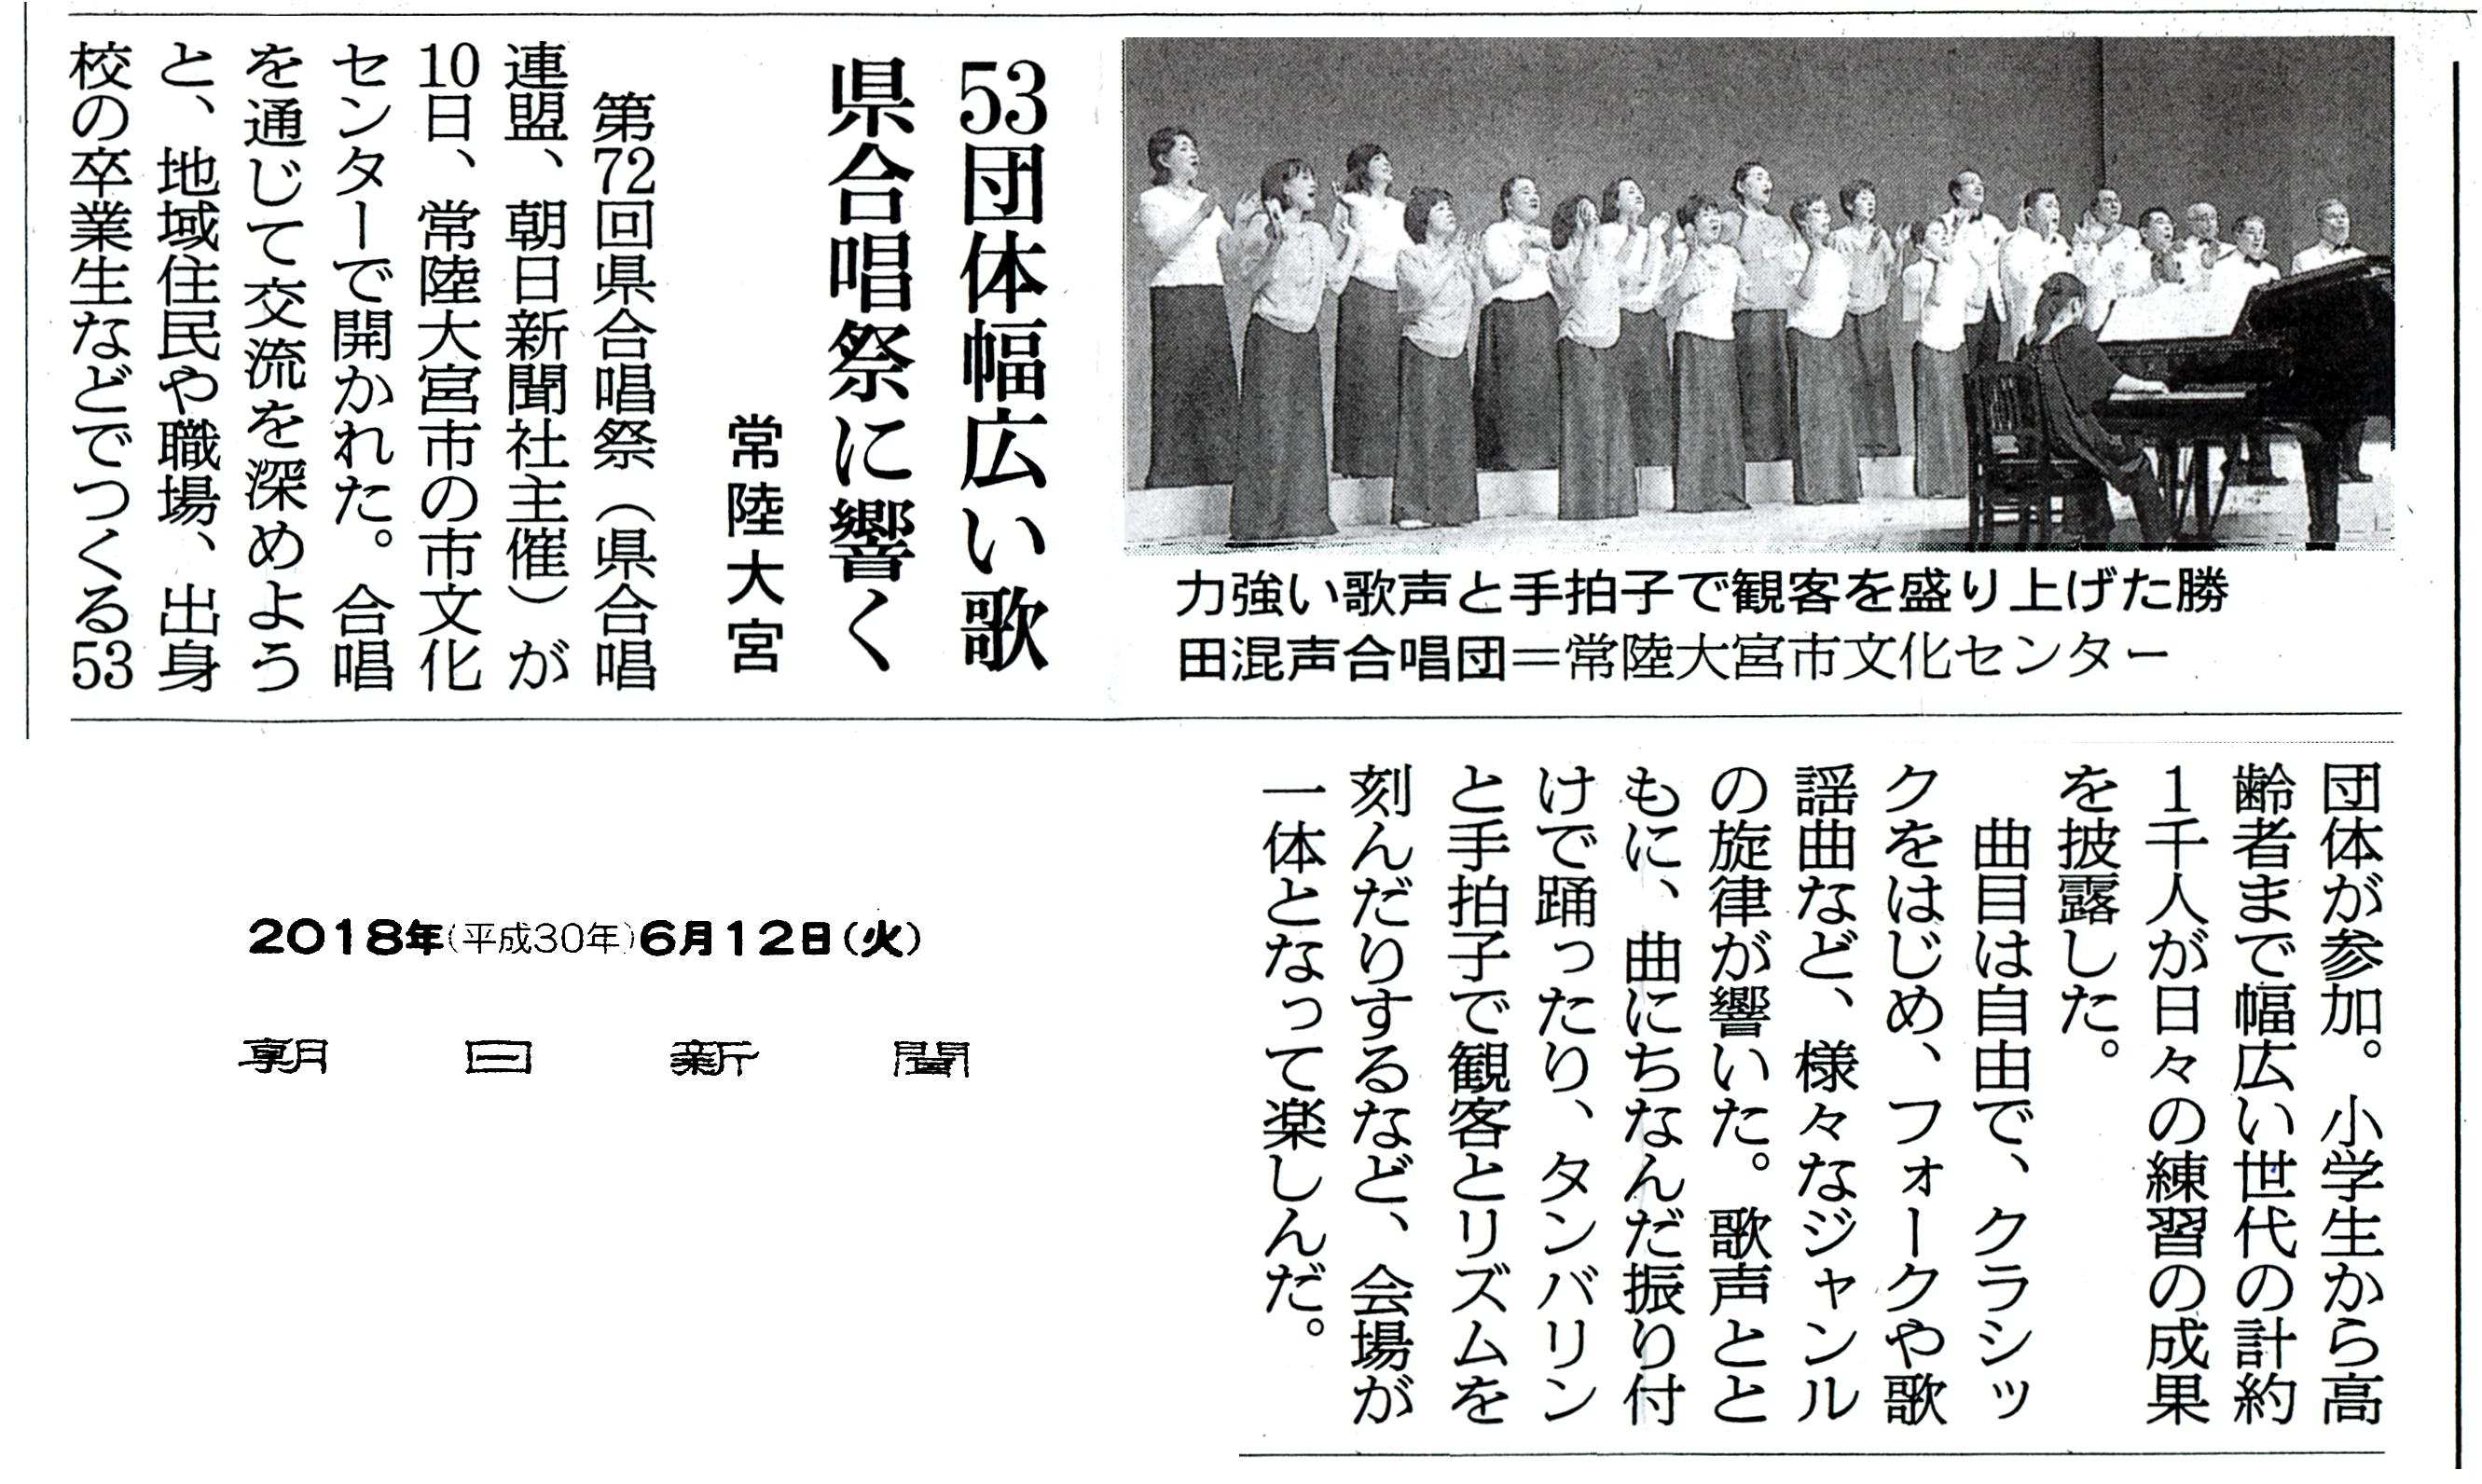 茨城県合唱祭での勝田混声紹介記事